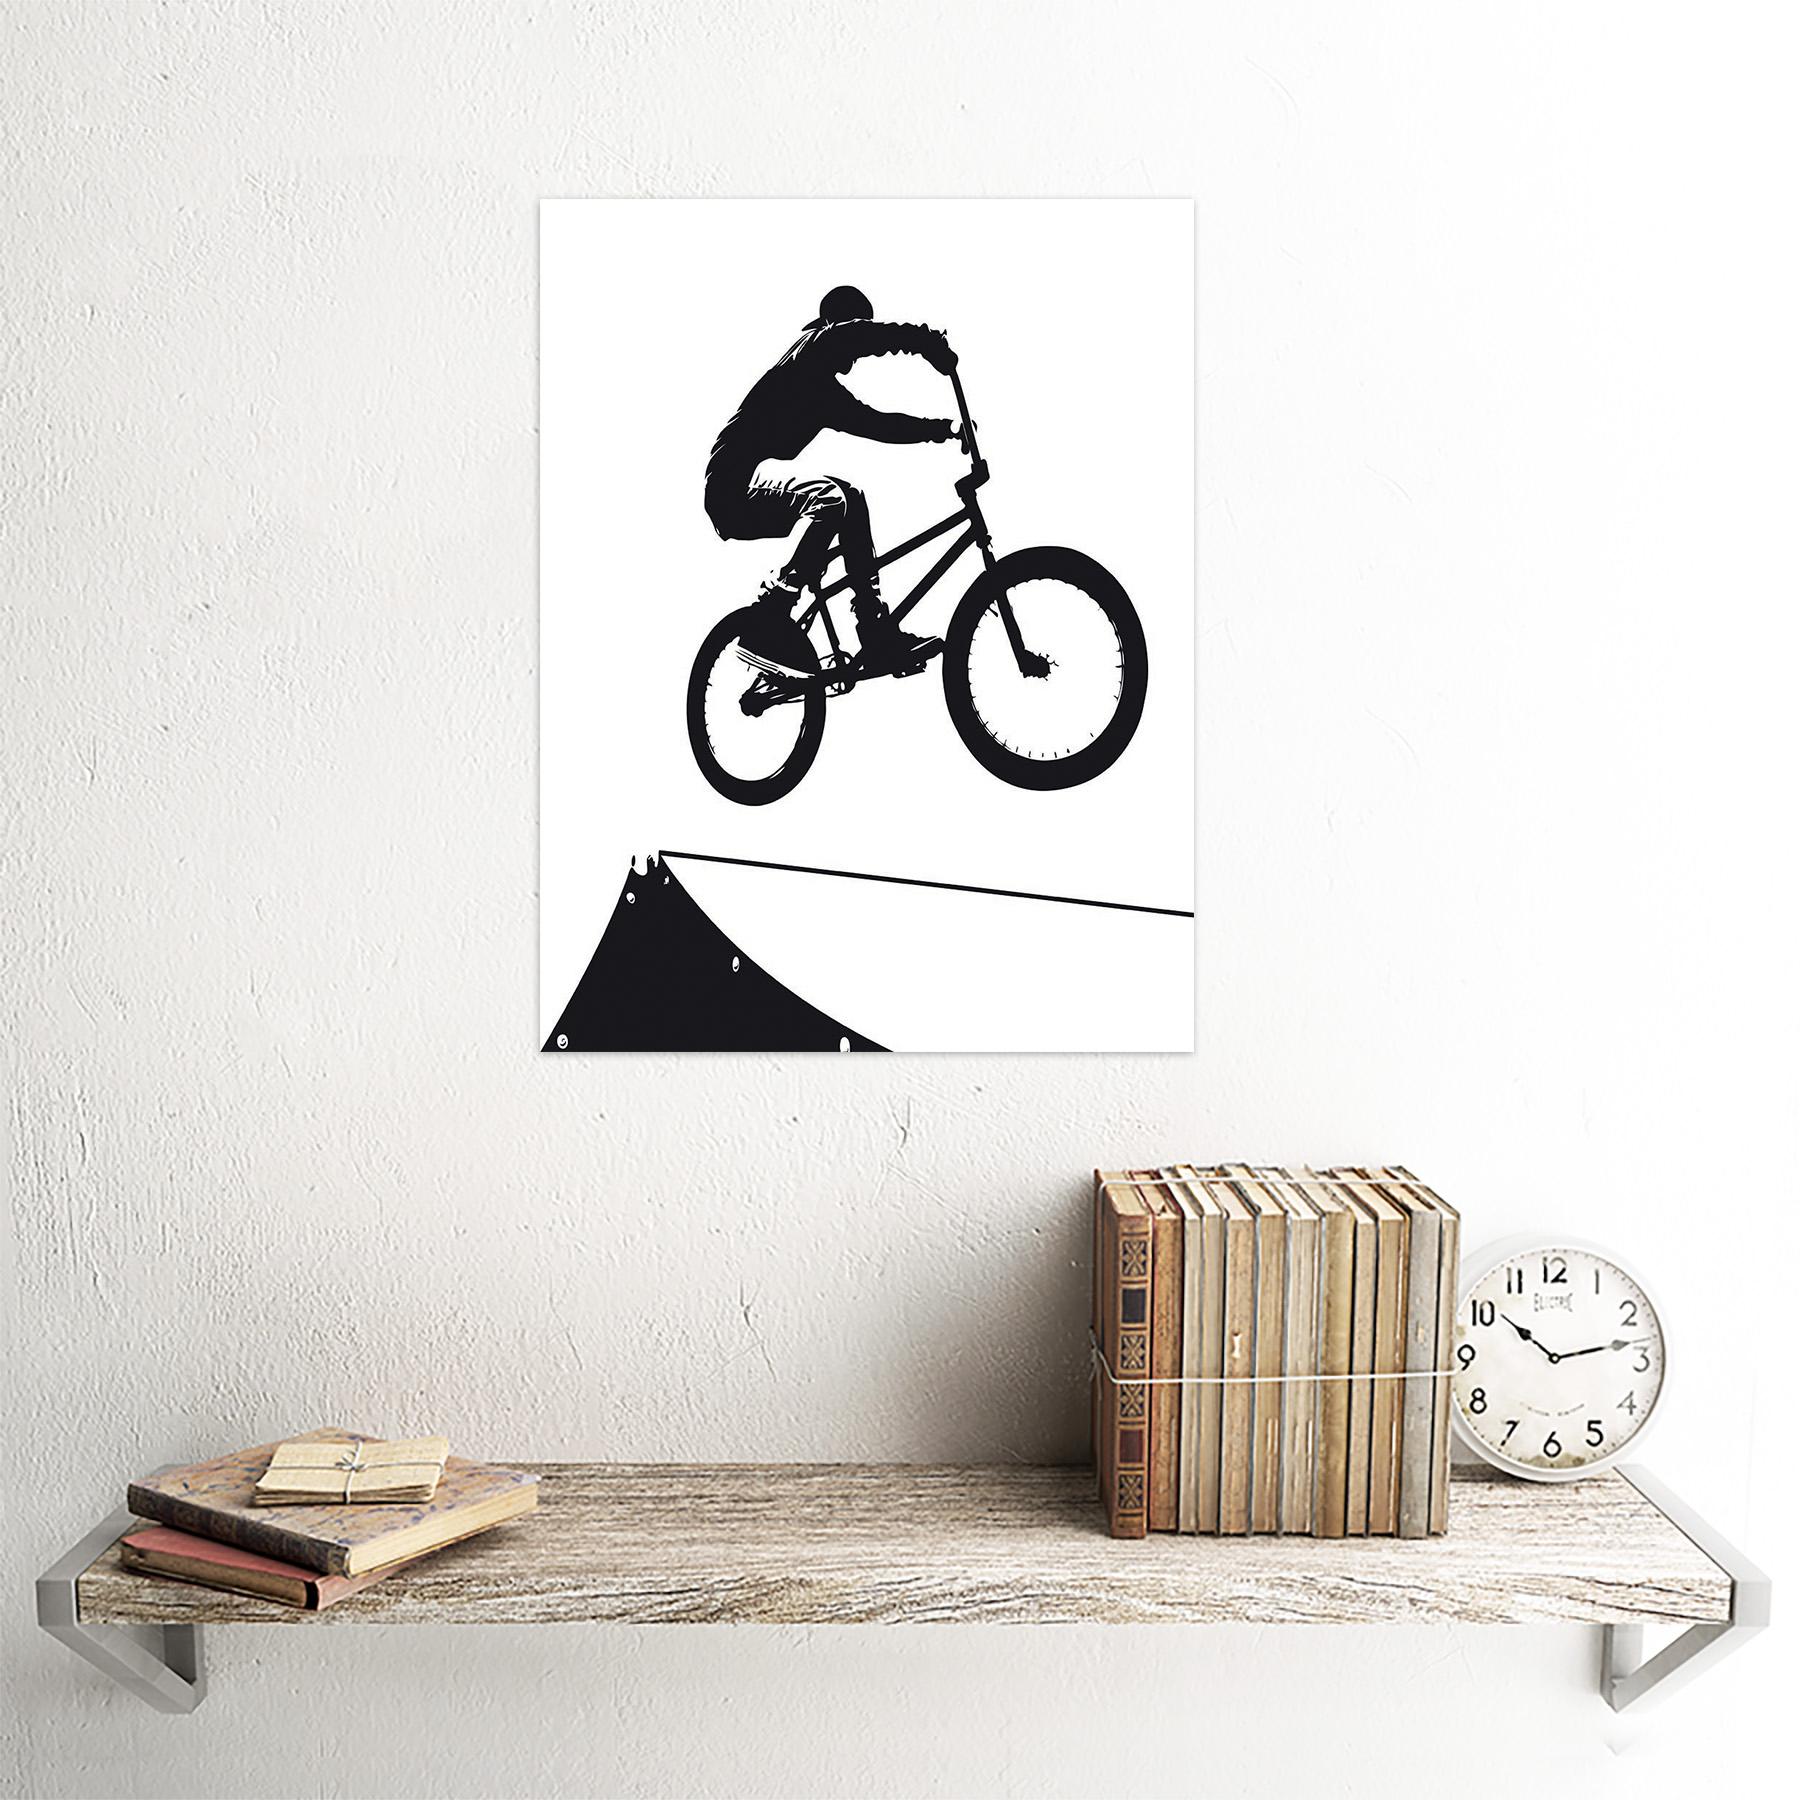 Indexbild 23 - Painting Sport Bmx Bike Bicycle Jump Air Ramp Black White 12X16 Framed Art Print